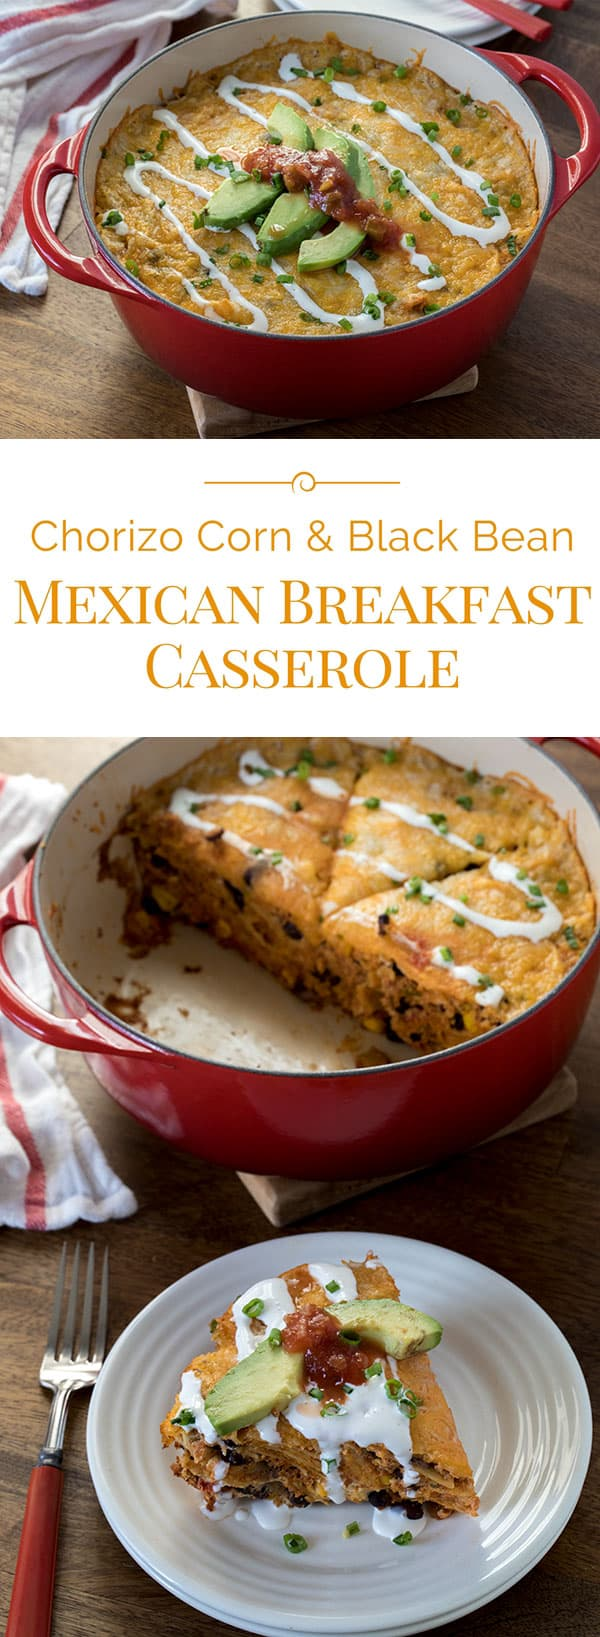 Titled recipe collage (and shown) Chorizo Corn Black Bean Mexican Breakfast Casserole